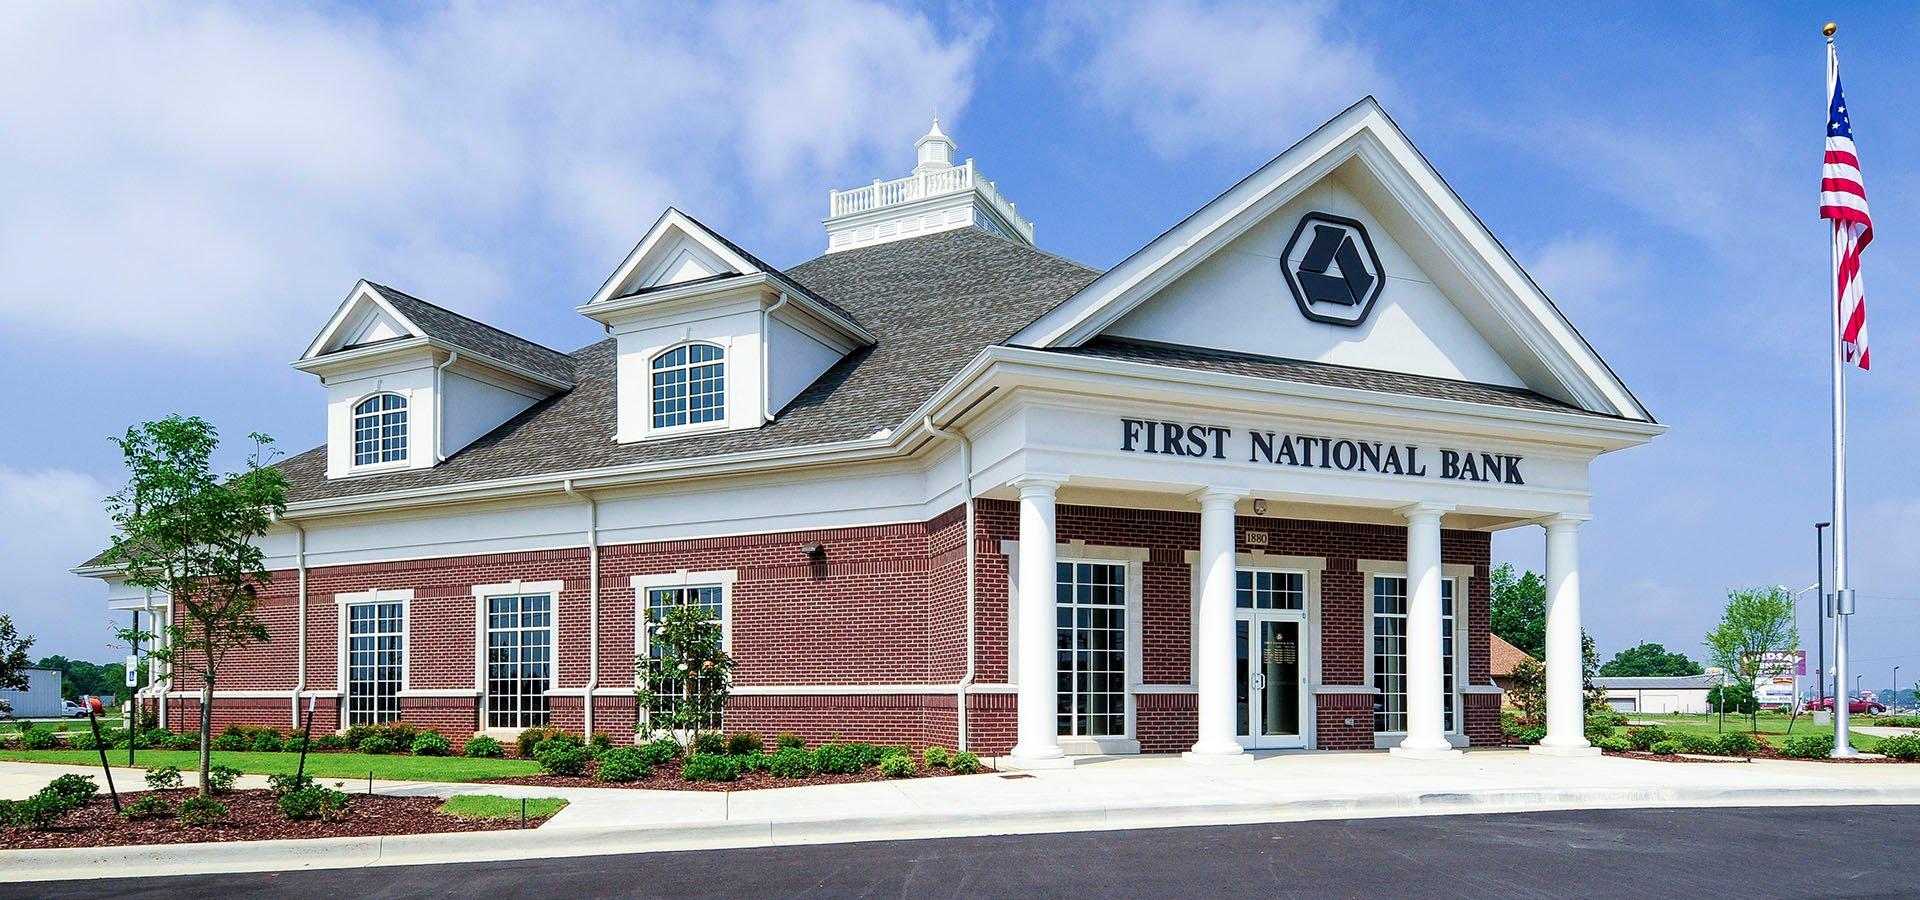 First National Bank | Athens, Alabama | Brindley Construction